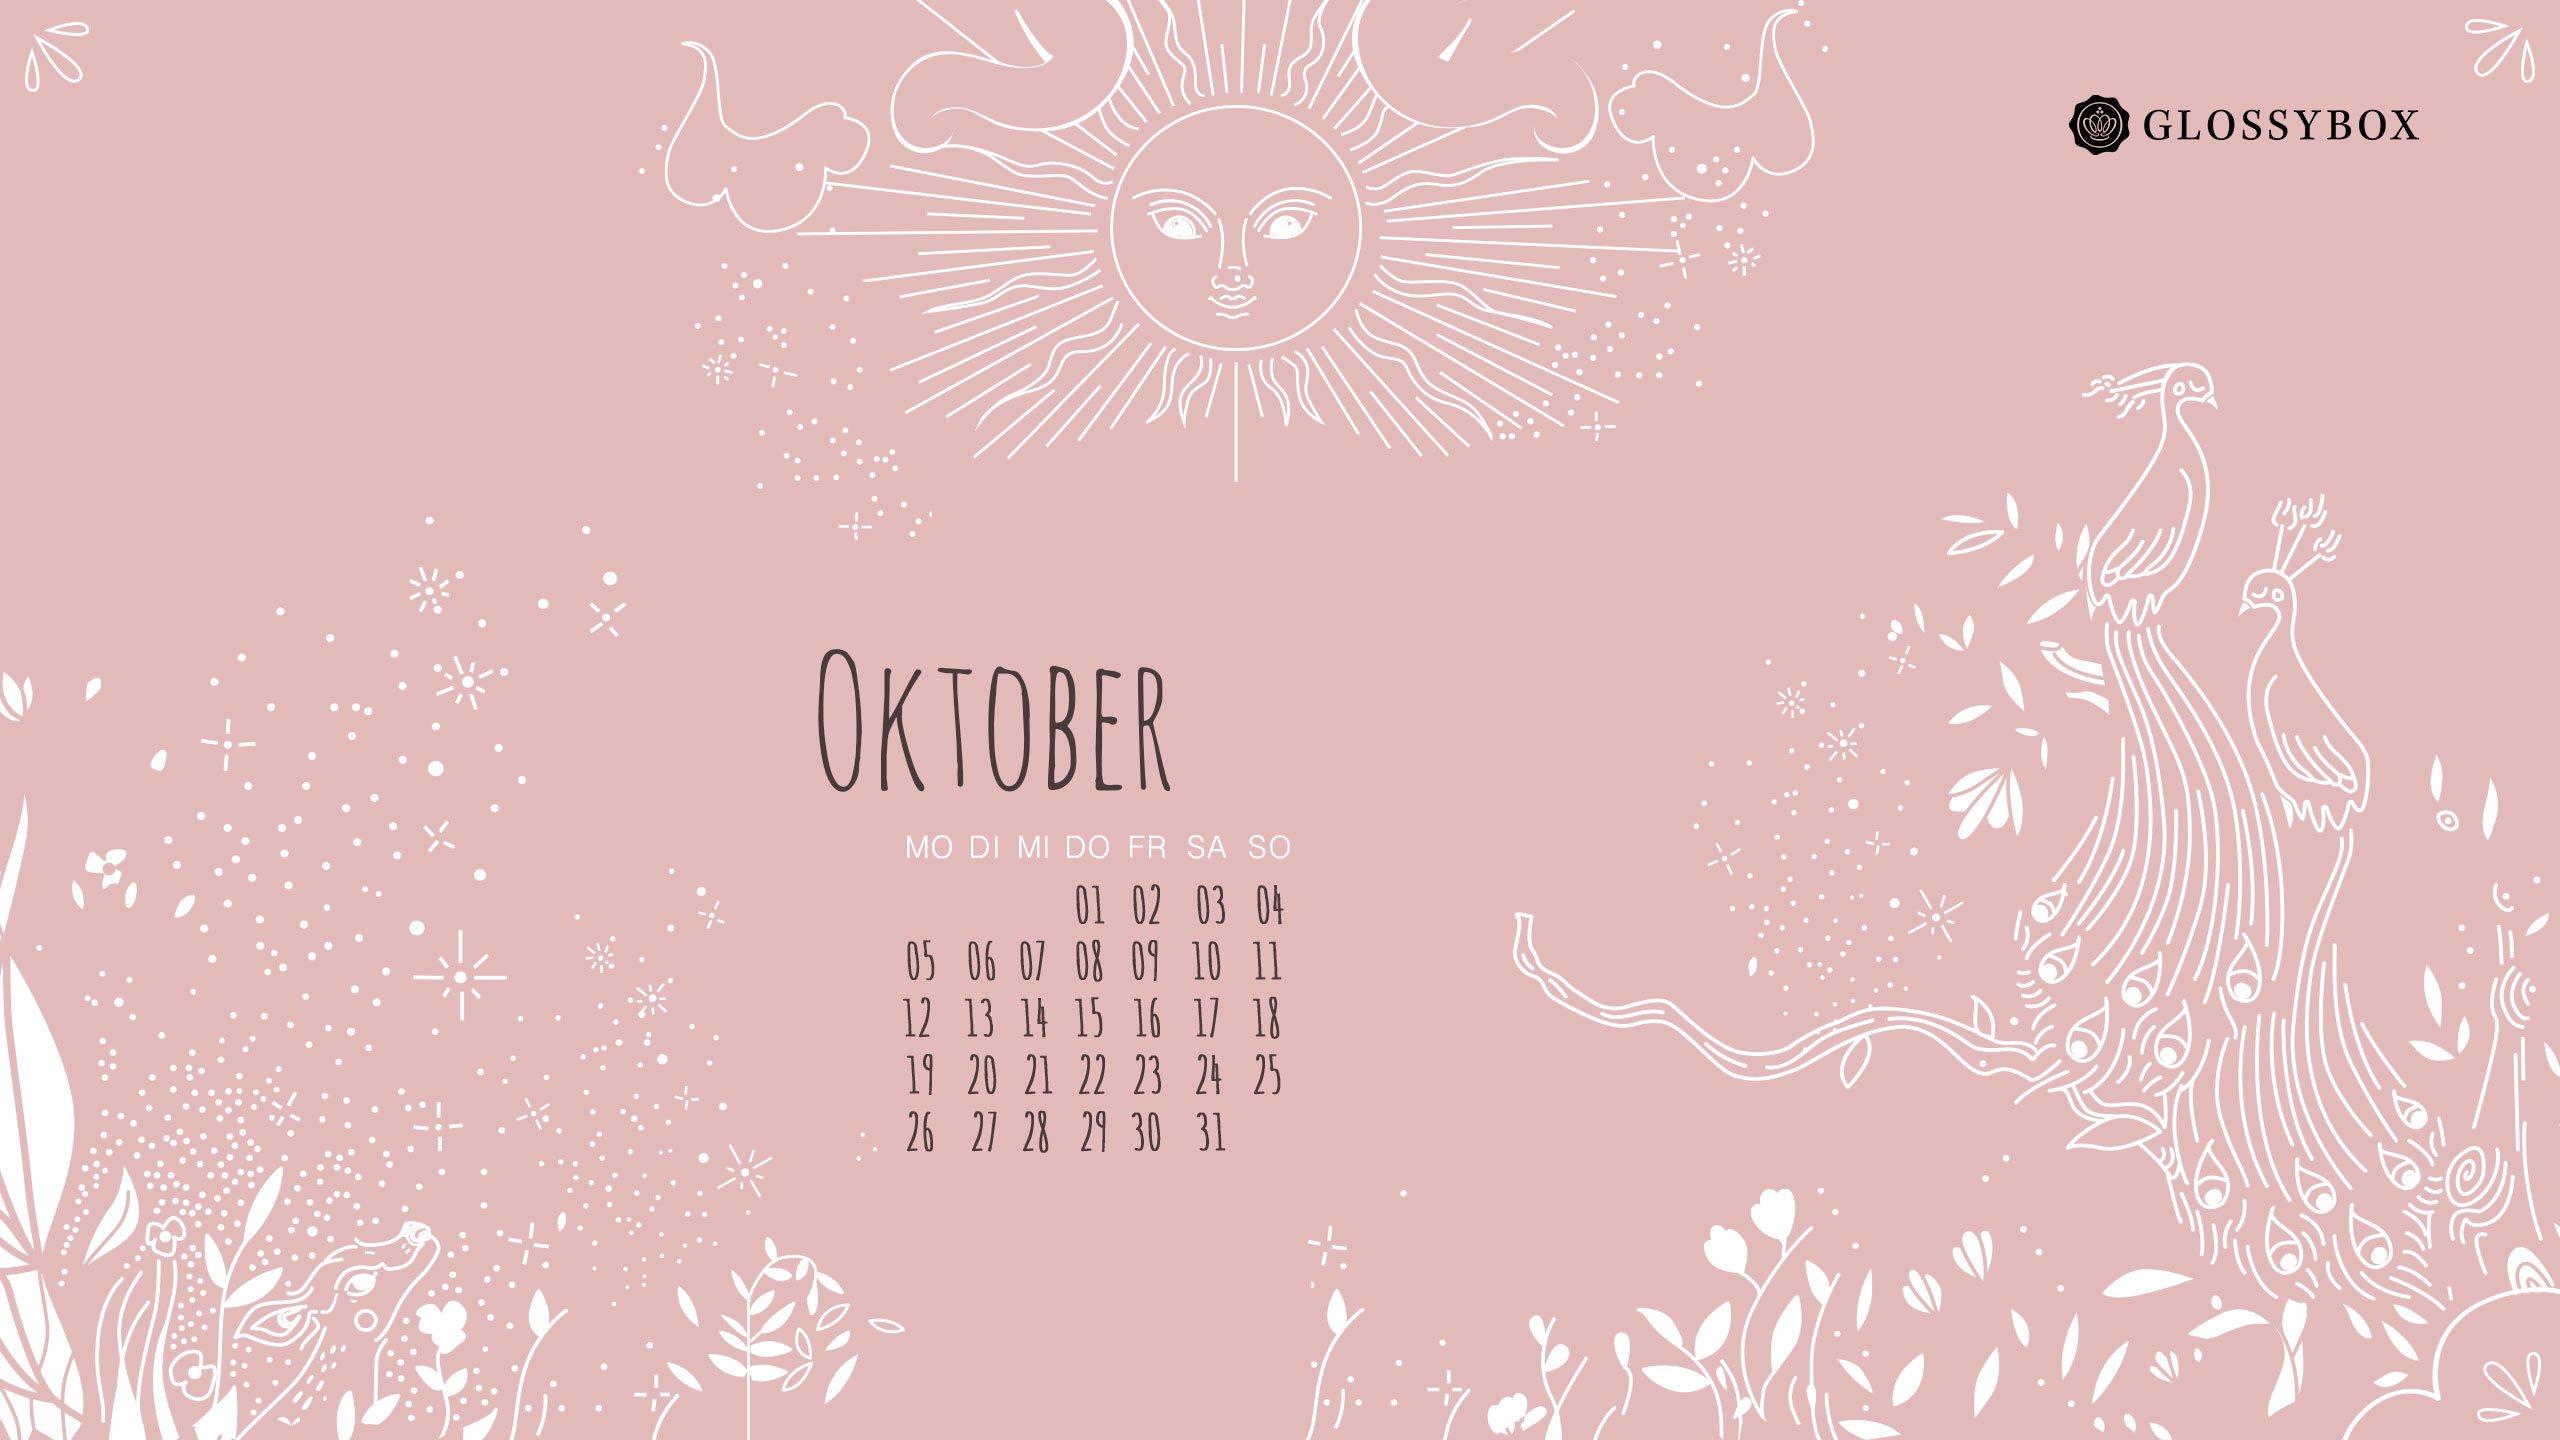 glossybox-wallpaper-screensaver-glossy-oktober-the-beauty-tales-gratis-herunterladen